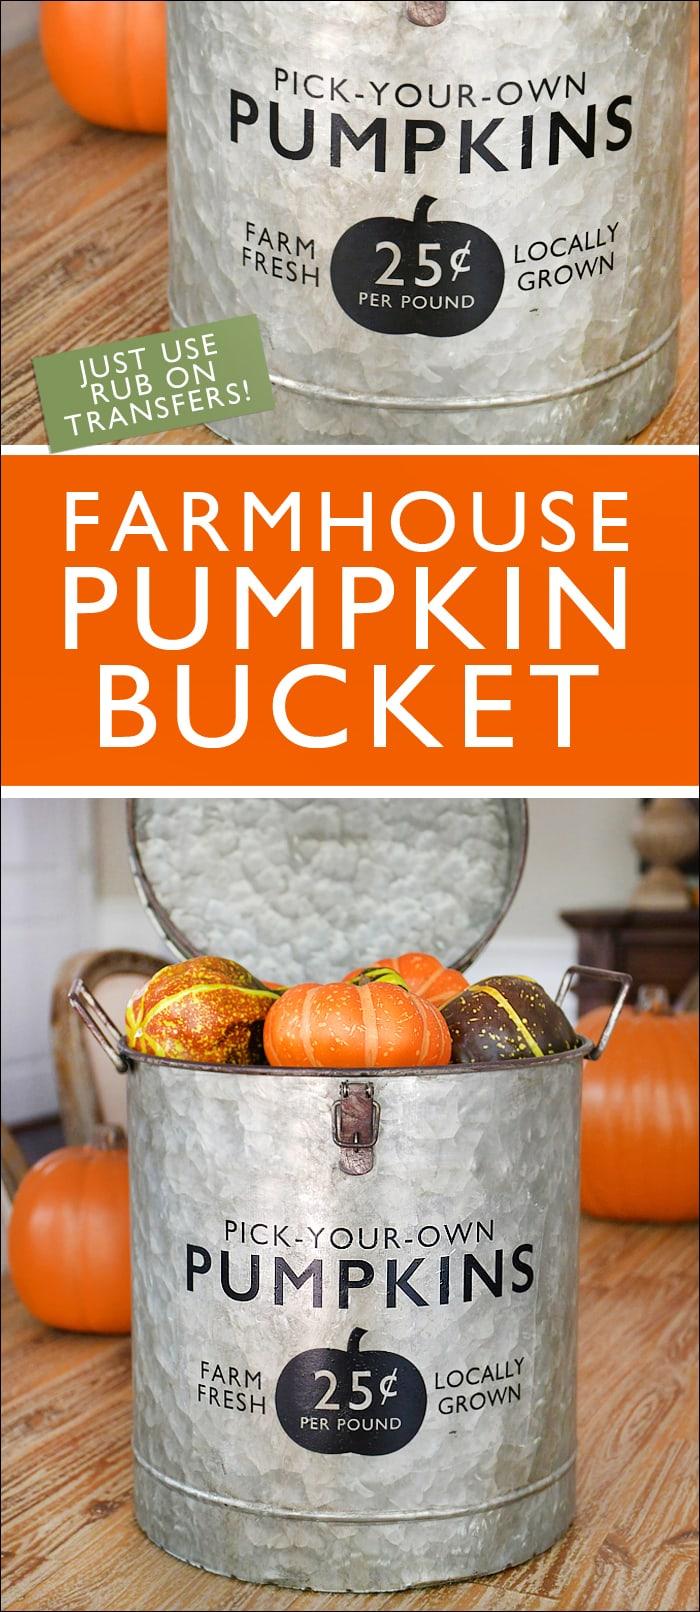 Farmhuse pumpkin bucket poster.